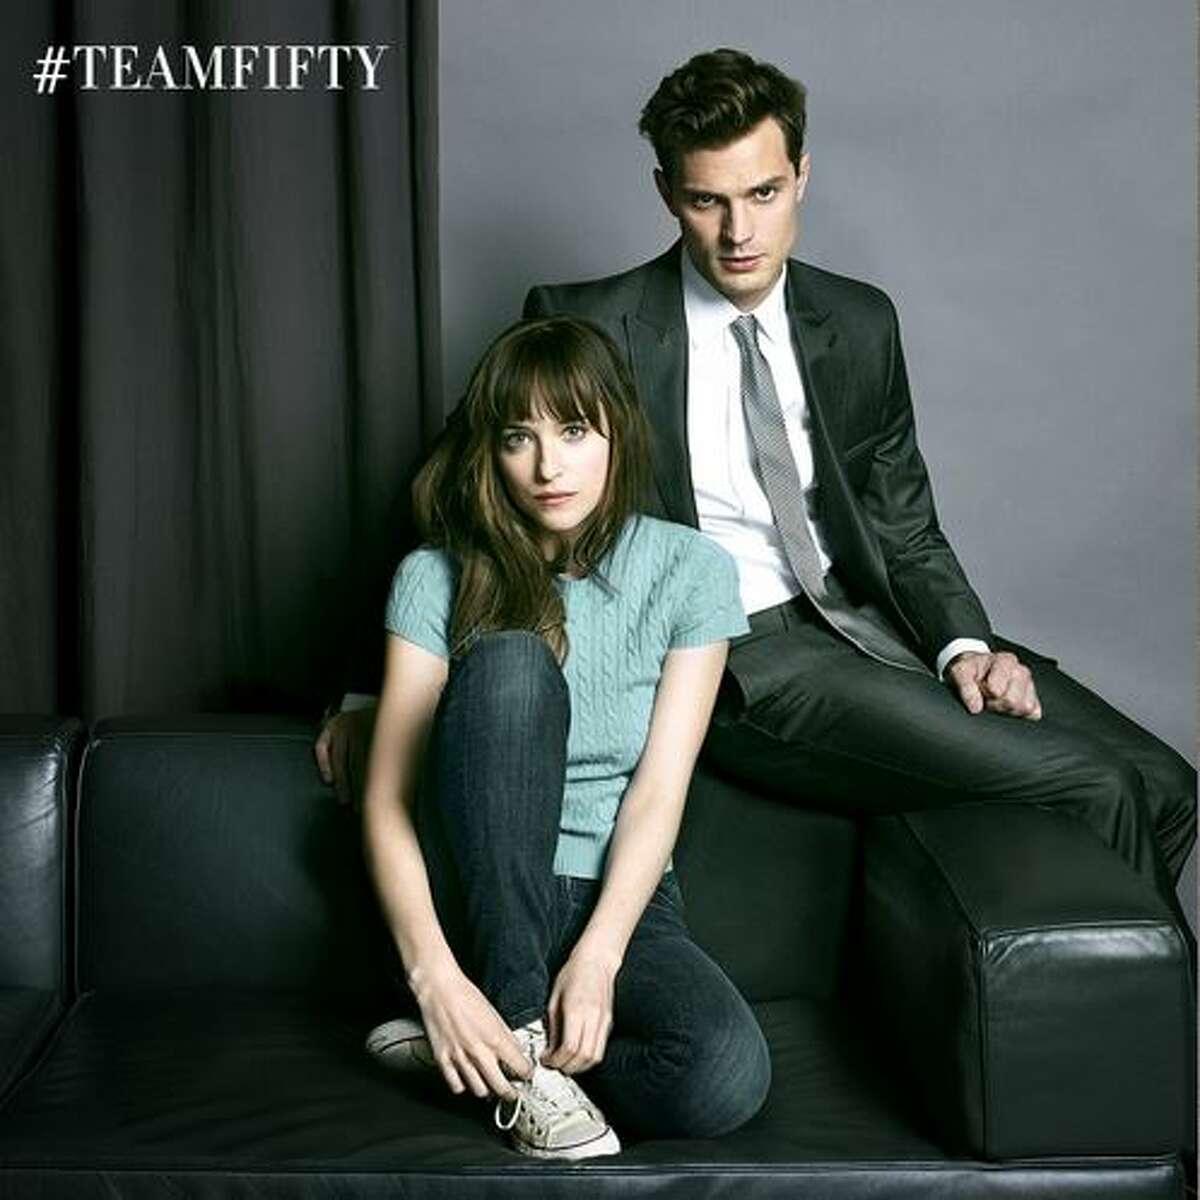 Jamie Dornan will play hunky Christian Grey and Dakota Johnson will play lip-biting Anastasia Steele in the movie adaption of